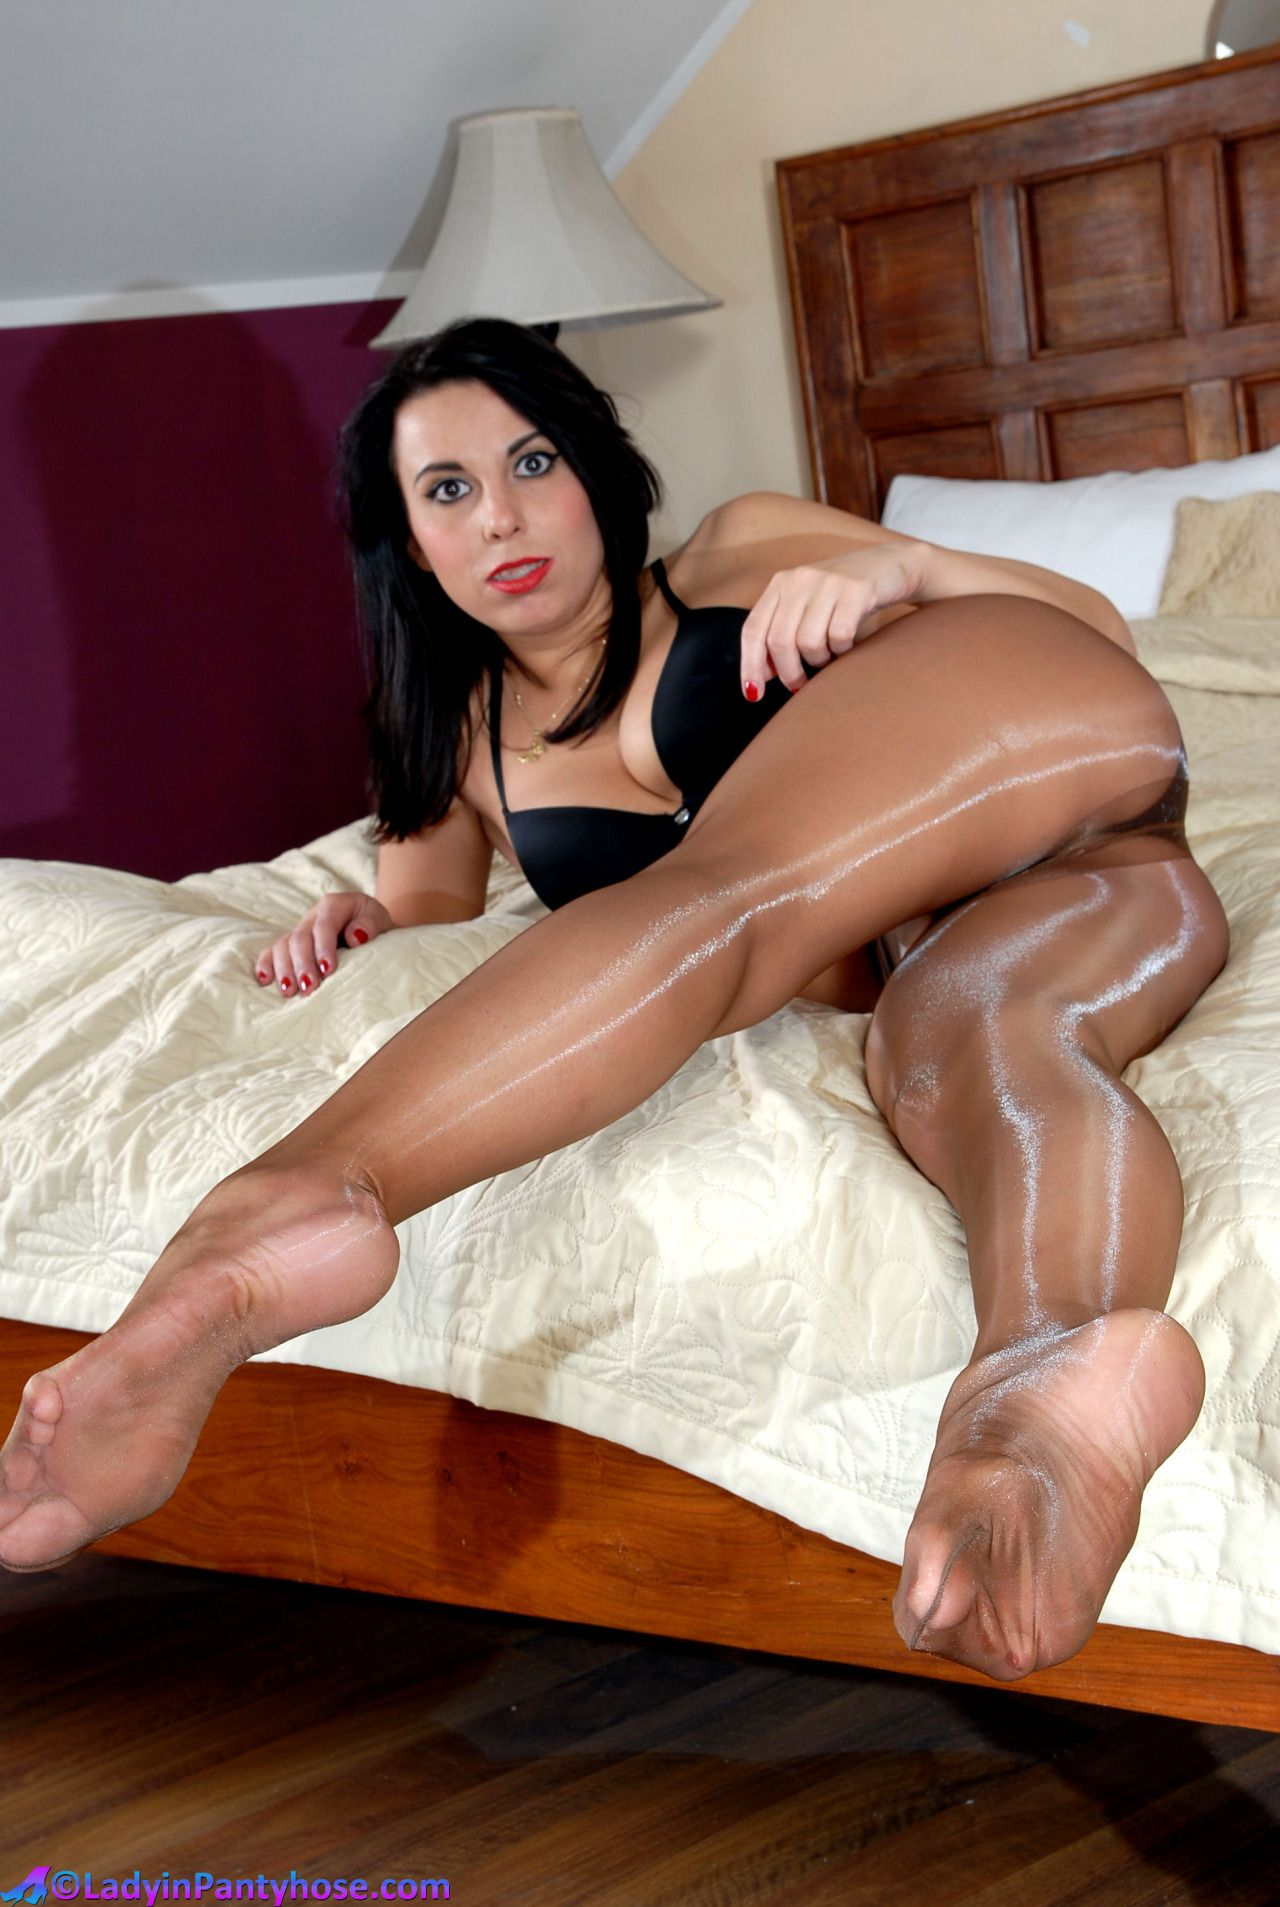 Rachel louise nude